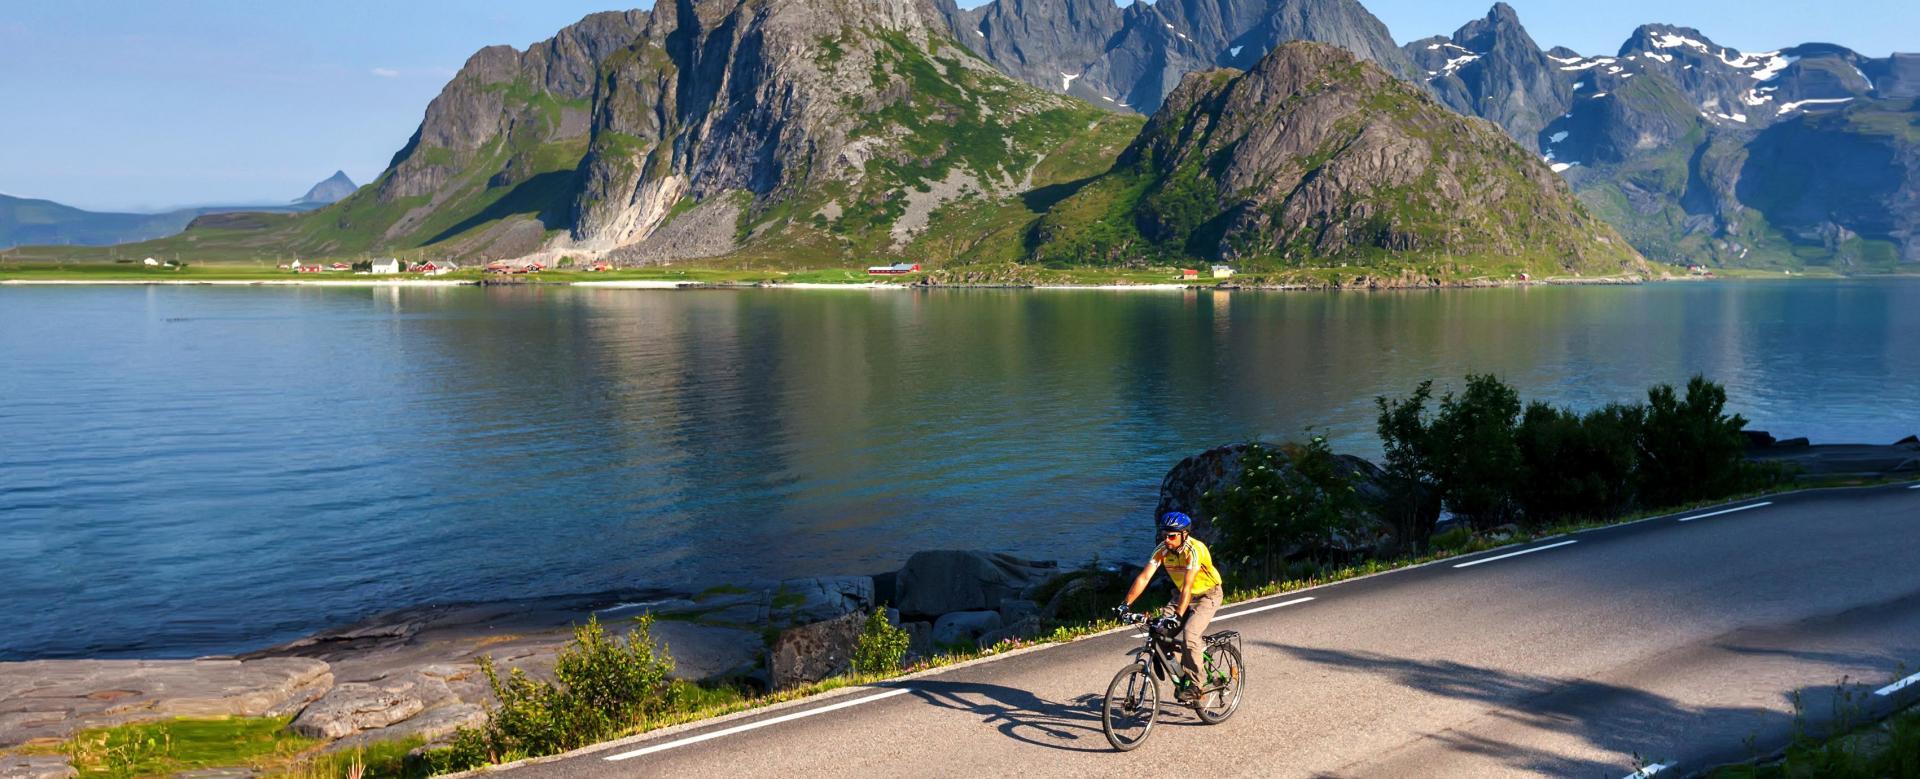 Voyage en véhicule Norvège : A vélo en terre viking